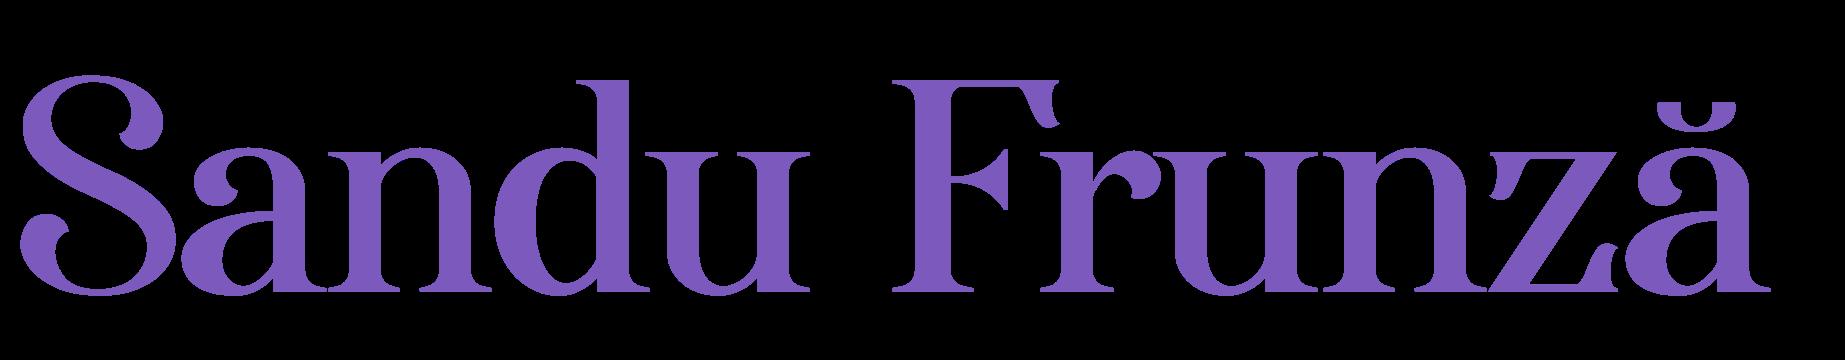 Sandu Frunză